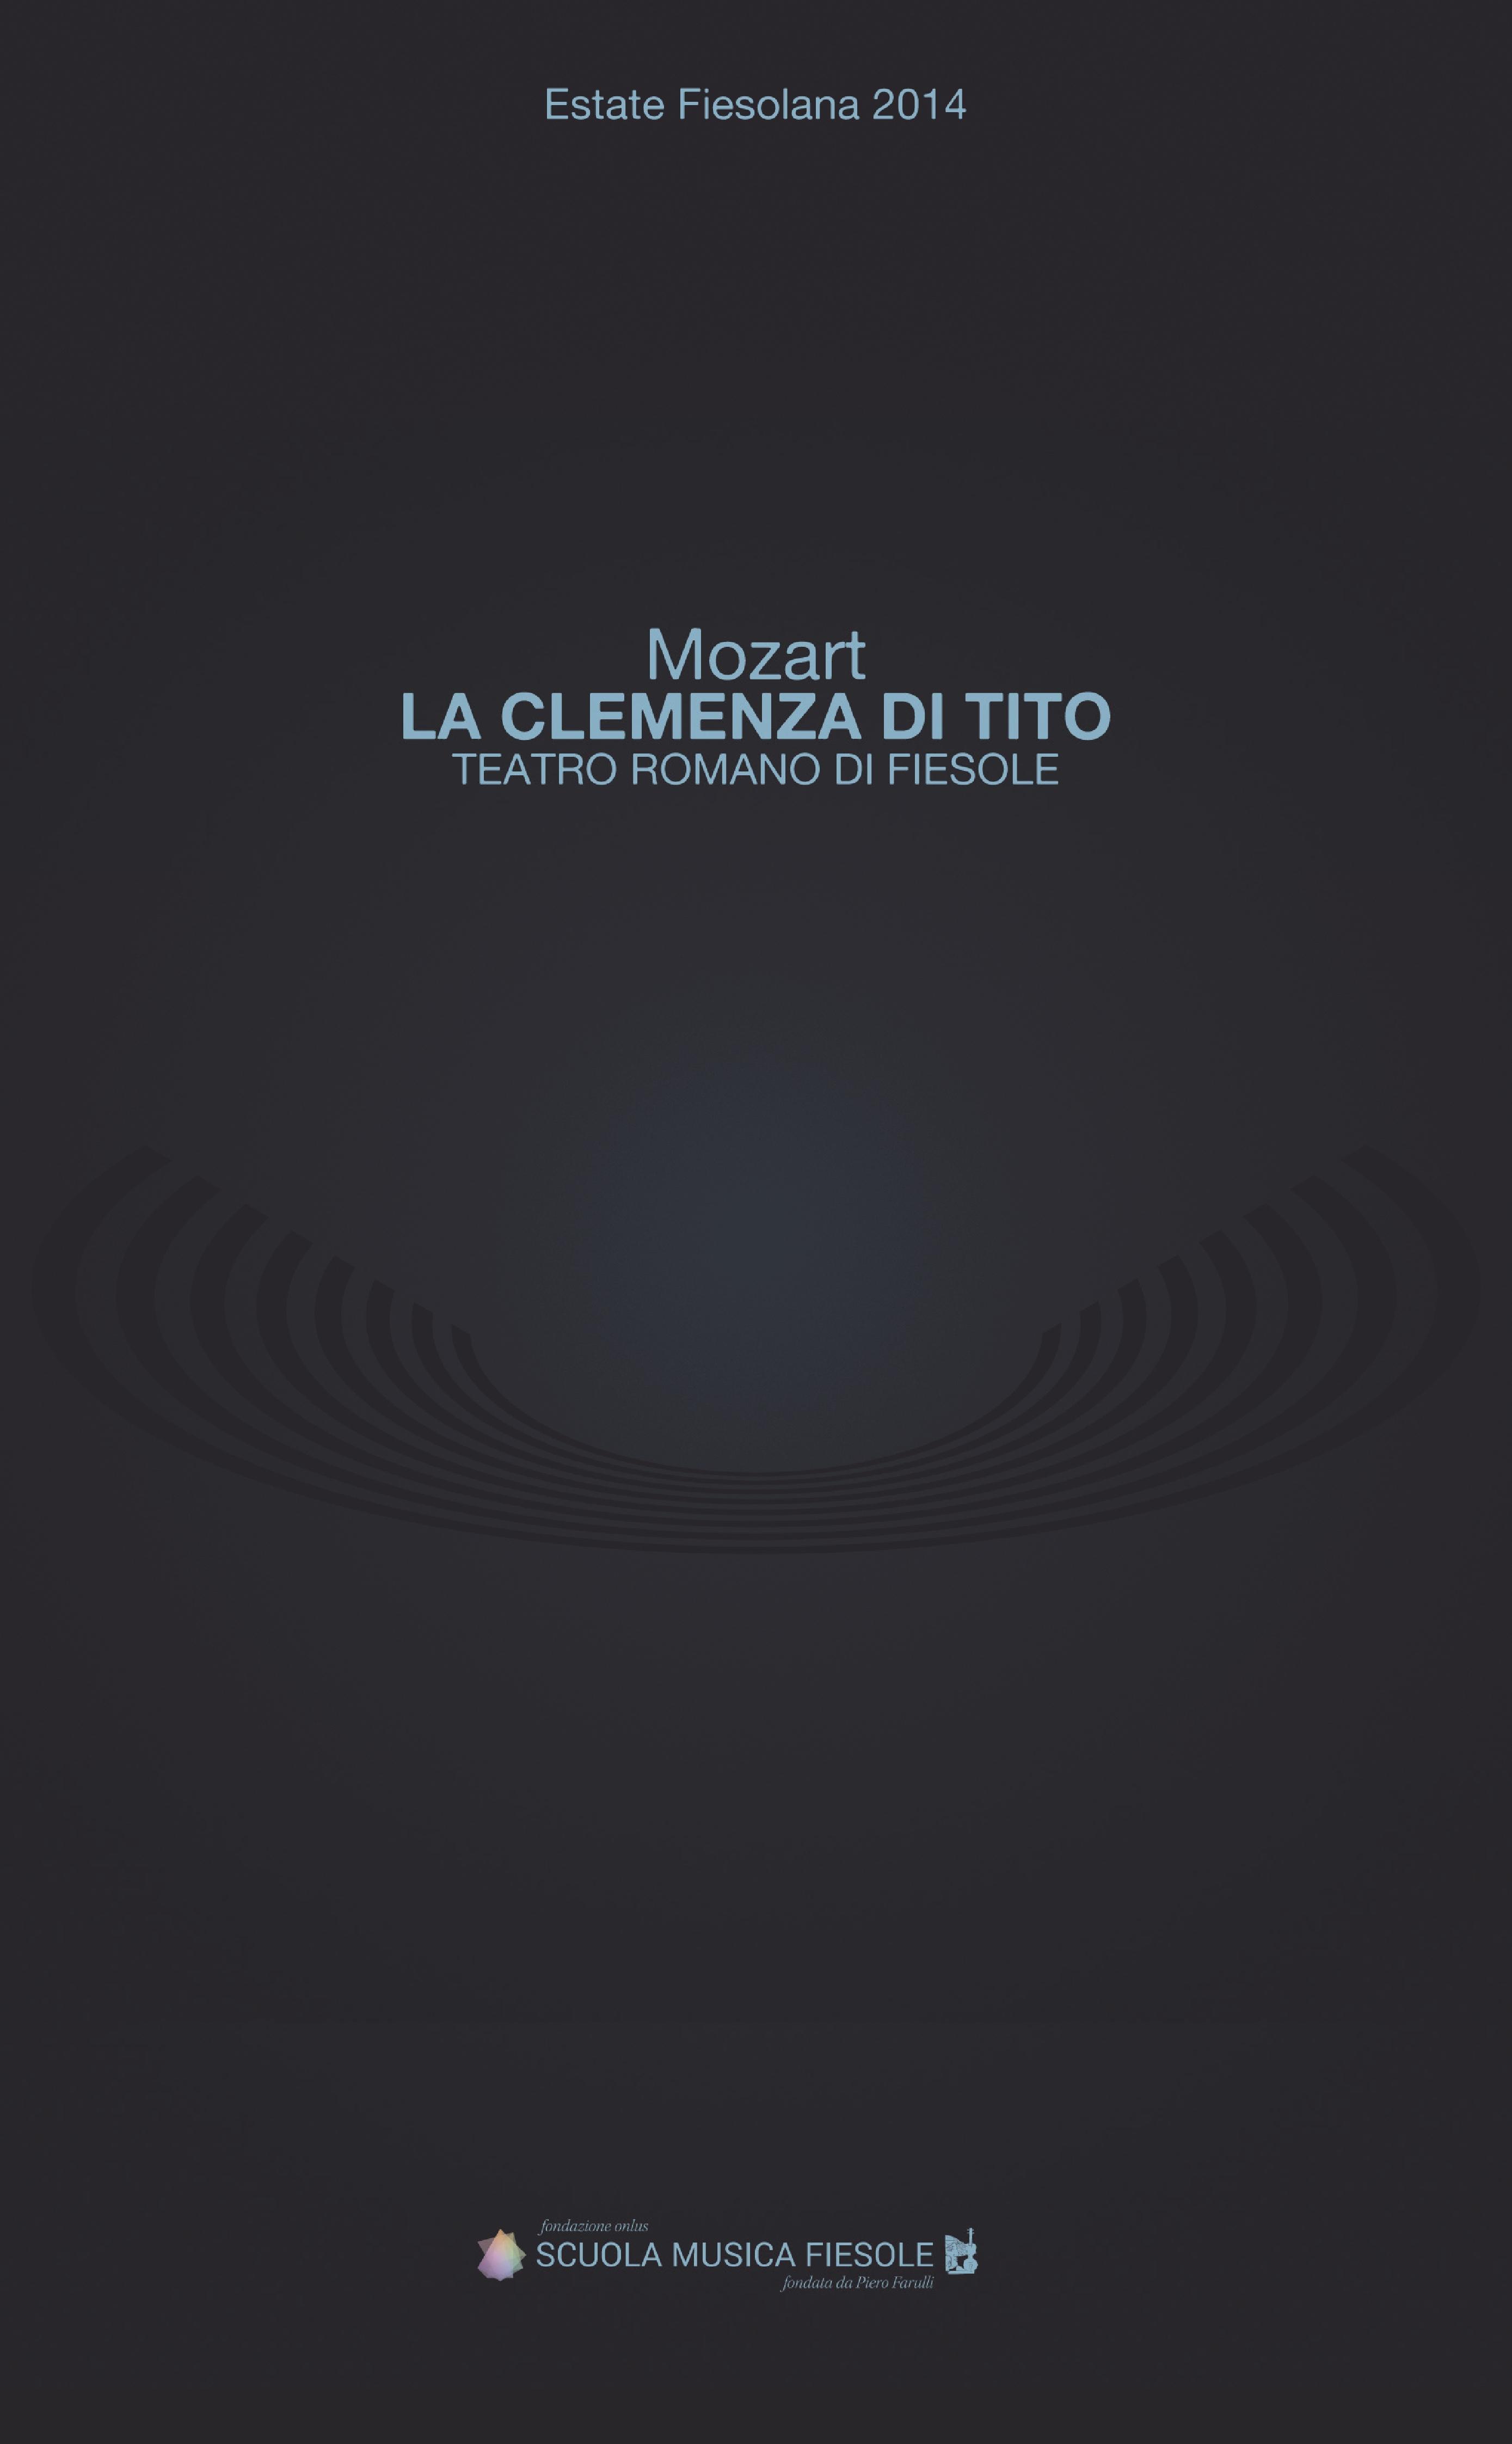 Отсутствует La clemenza di Tito di Wolfgang Amadeus Mozart al Teatro romano di Fiesole al di meola al di meola opus 2 lp